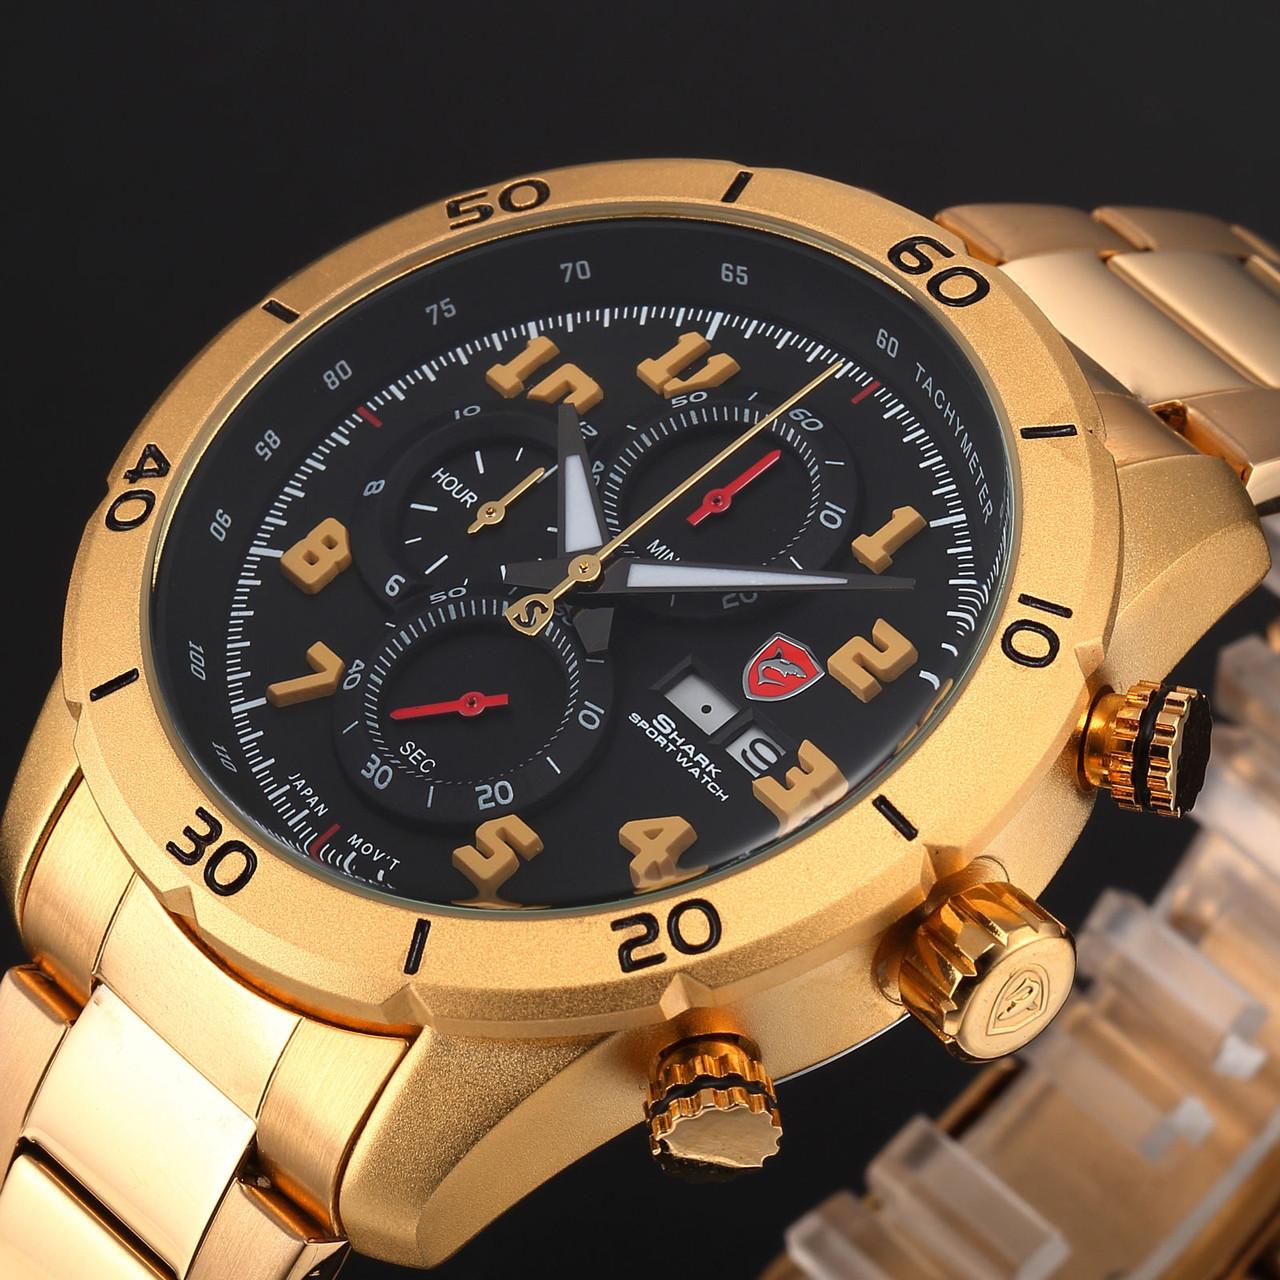 Мужские наручные часы Shark Black Gold Chronograph Stainless Steel Date Day Quartz Sport Watch SH314